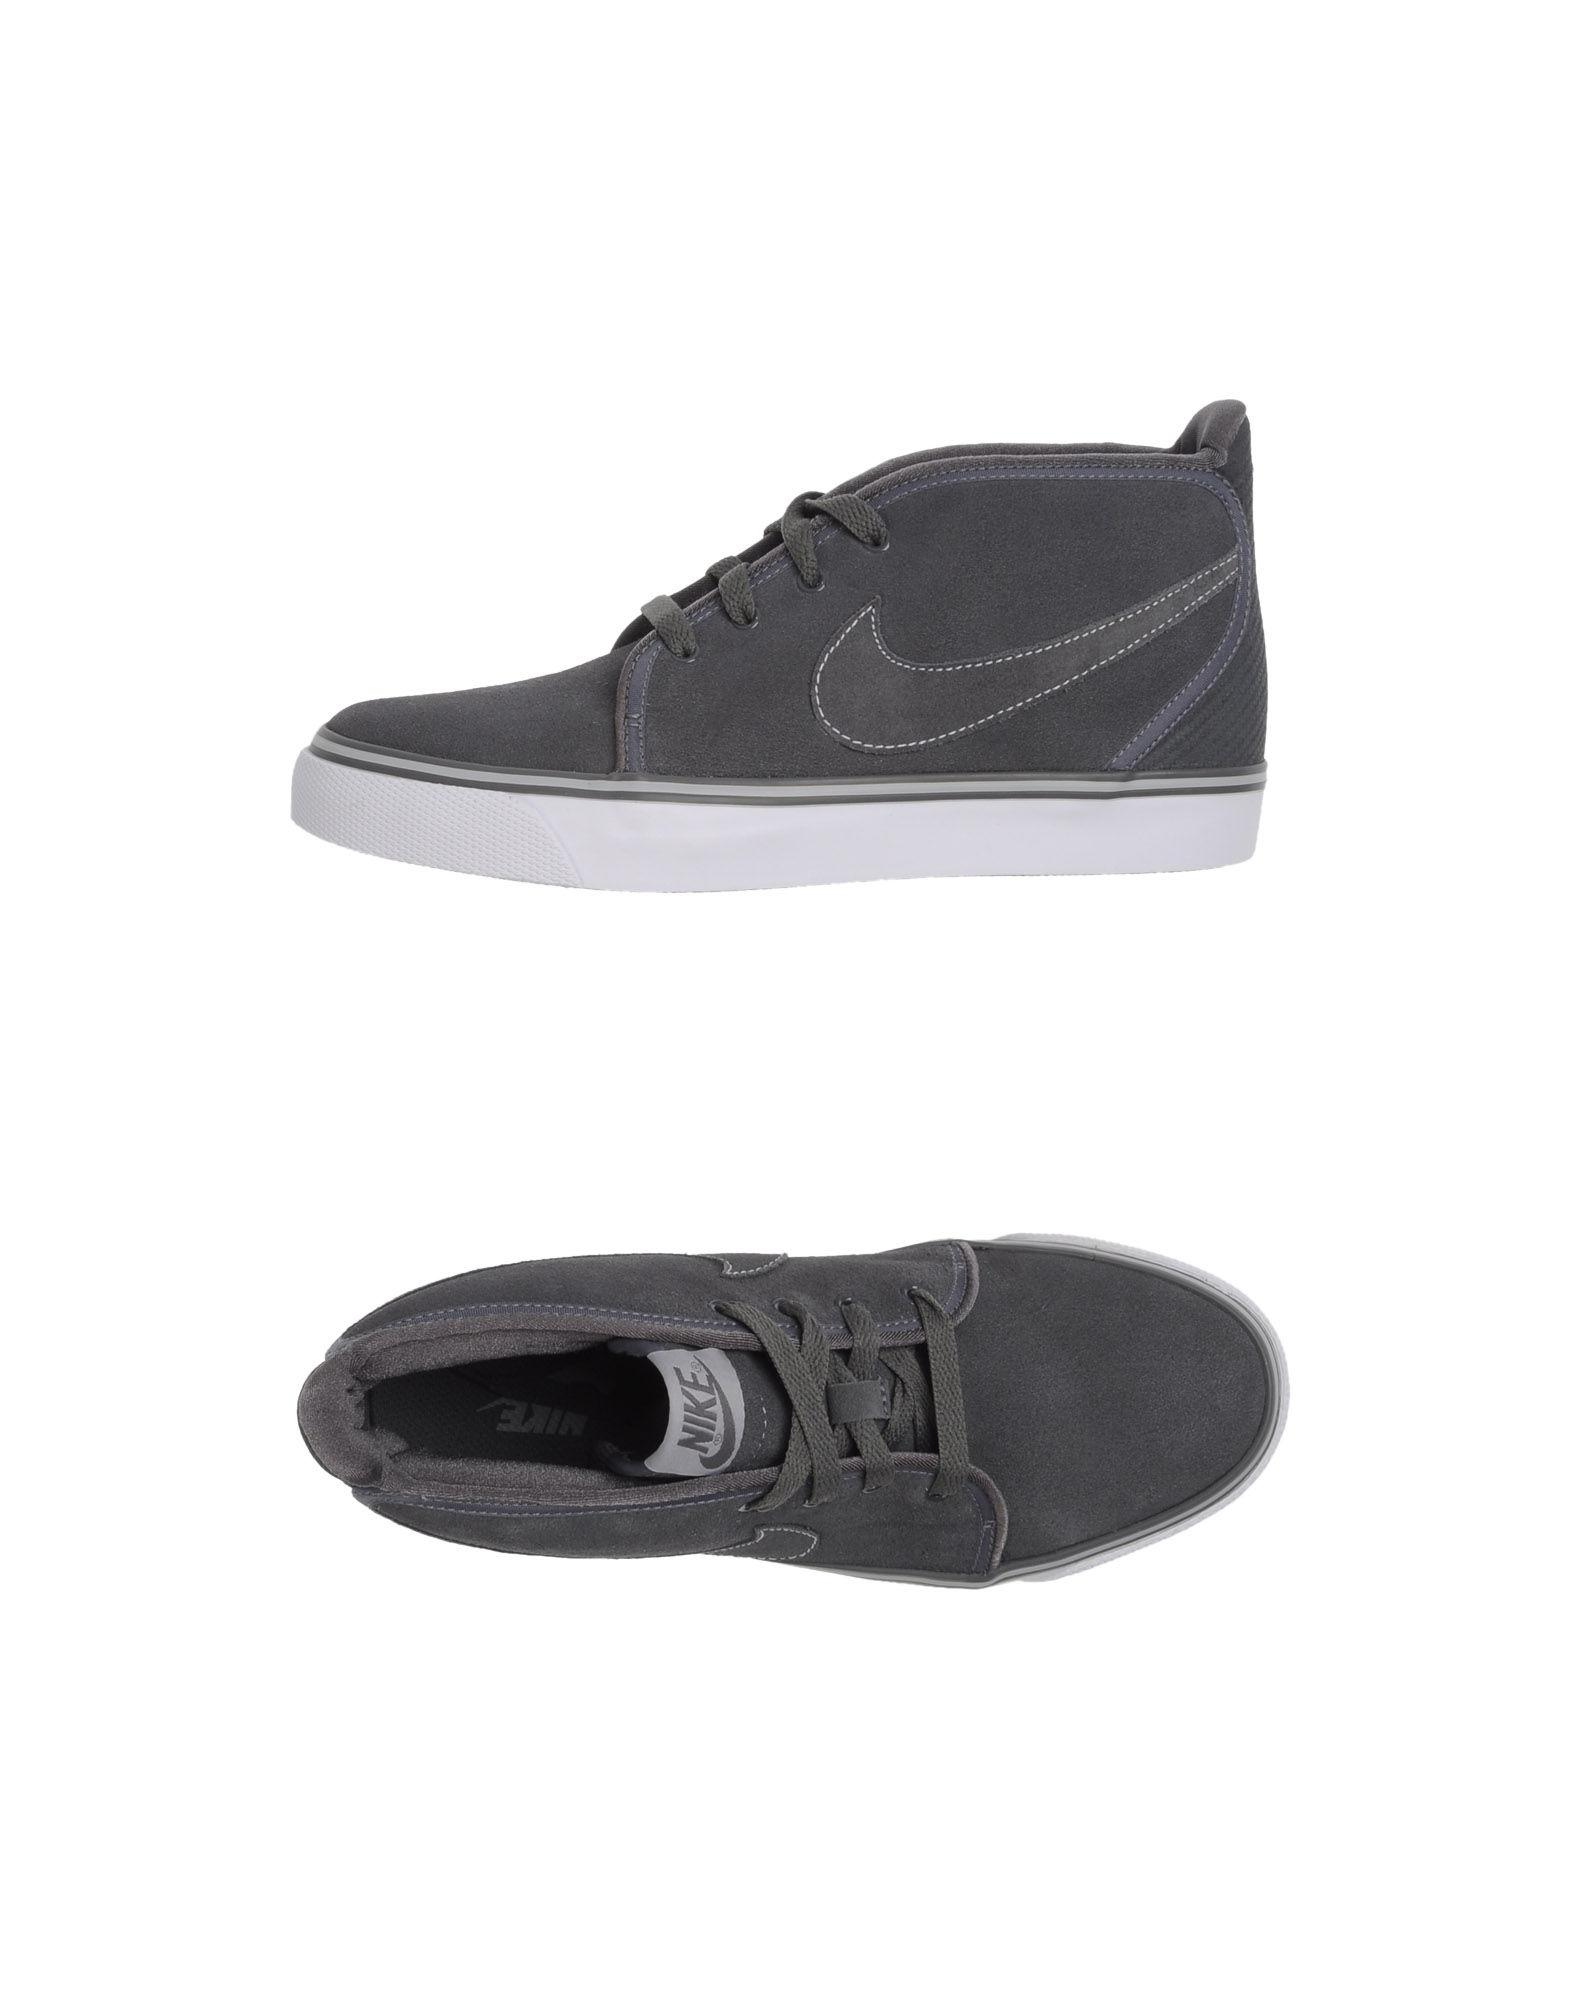 lyst nike hightop sneakers in gray for men